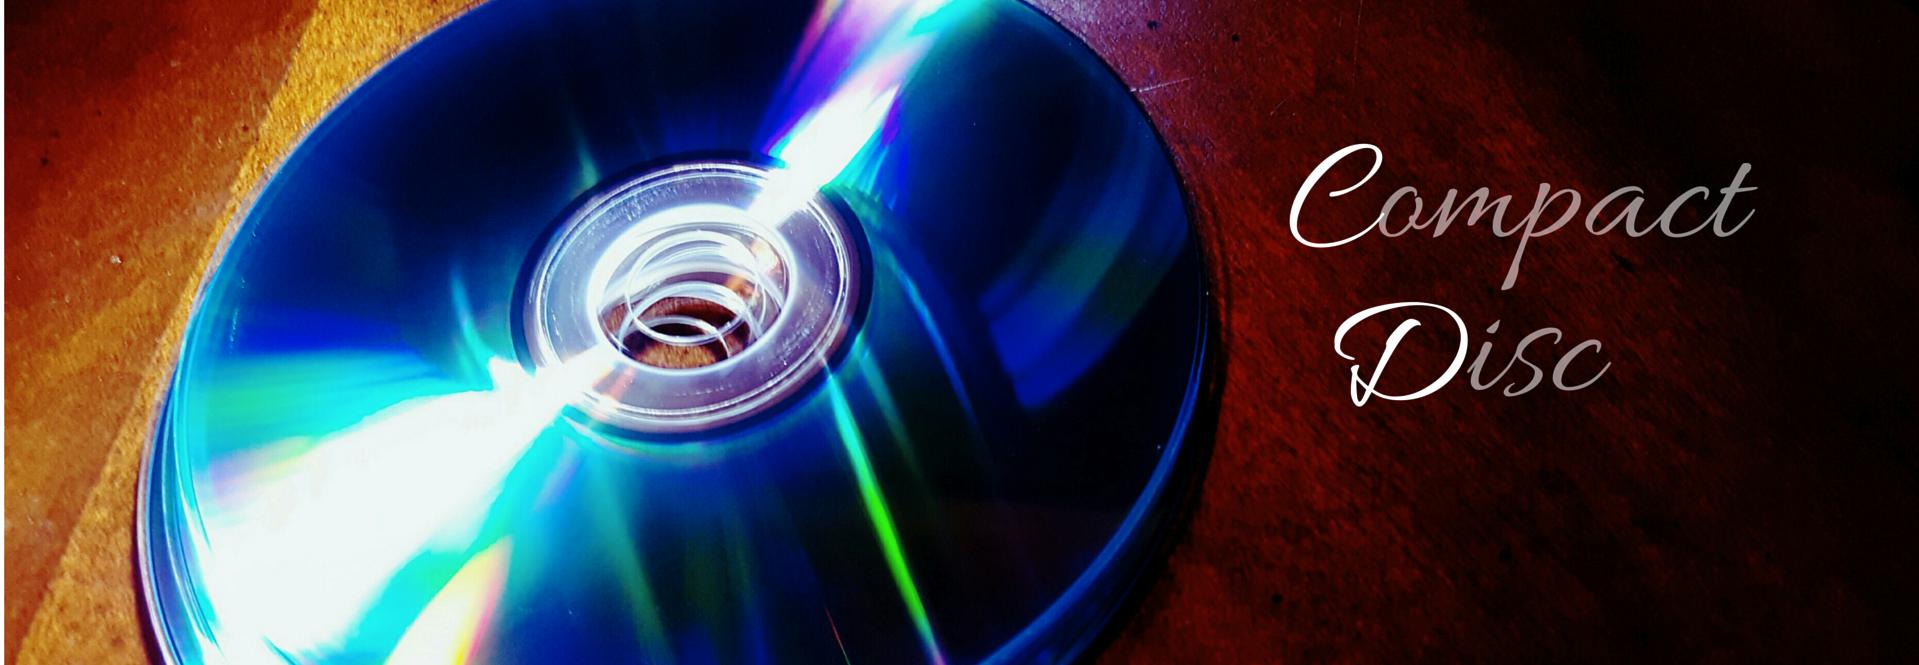 Speak House Audio Transfers-Compact Disc